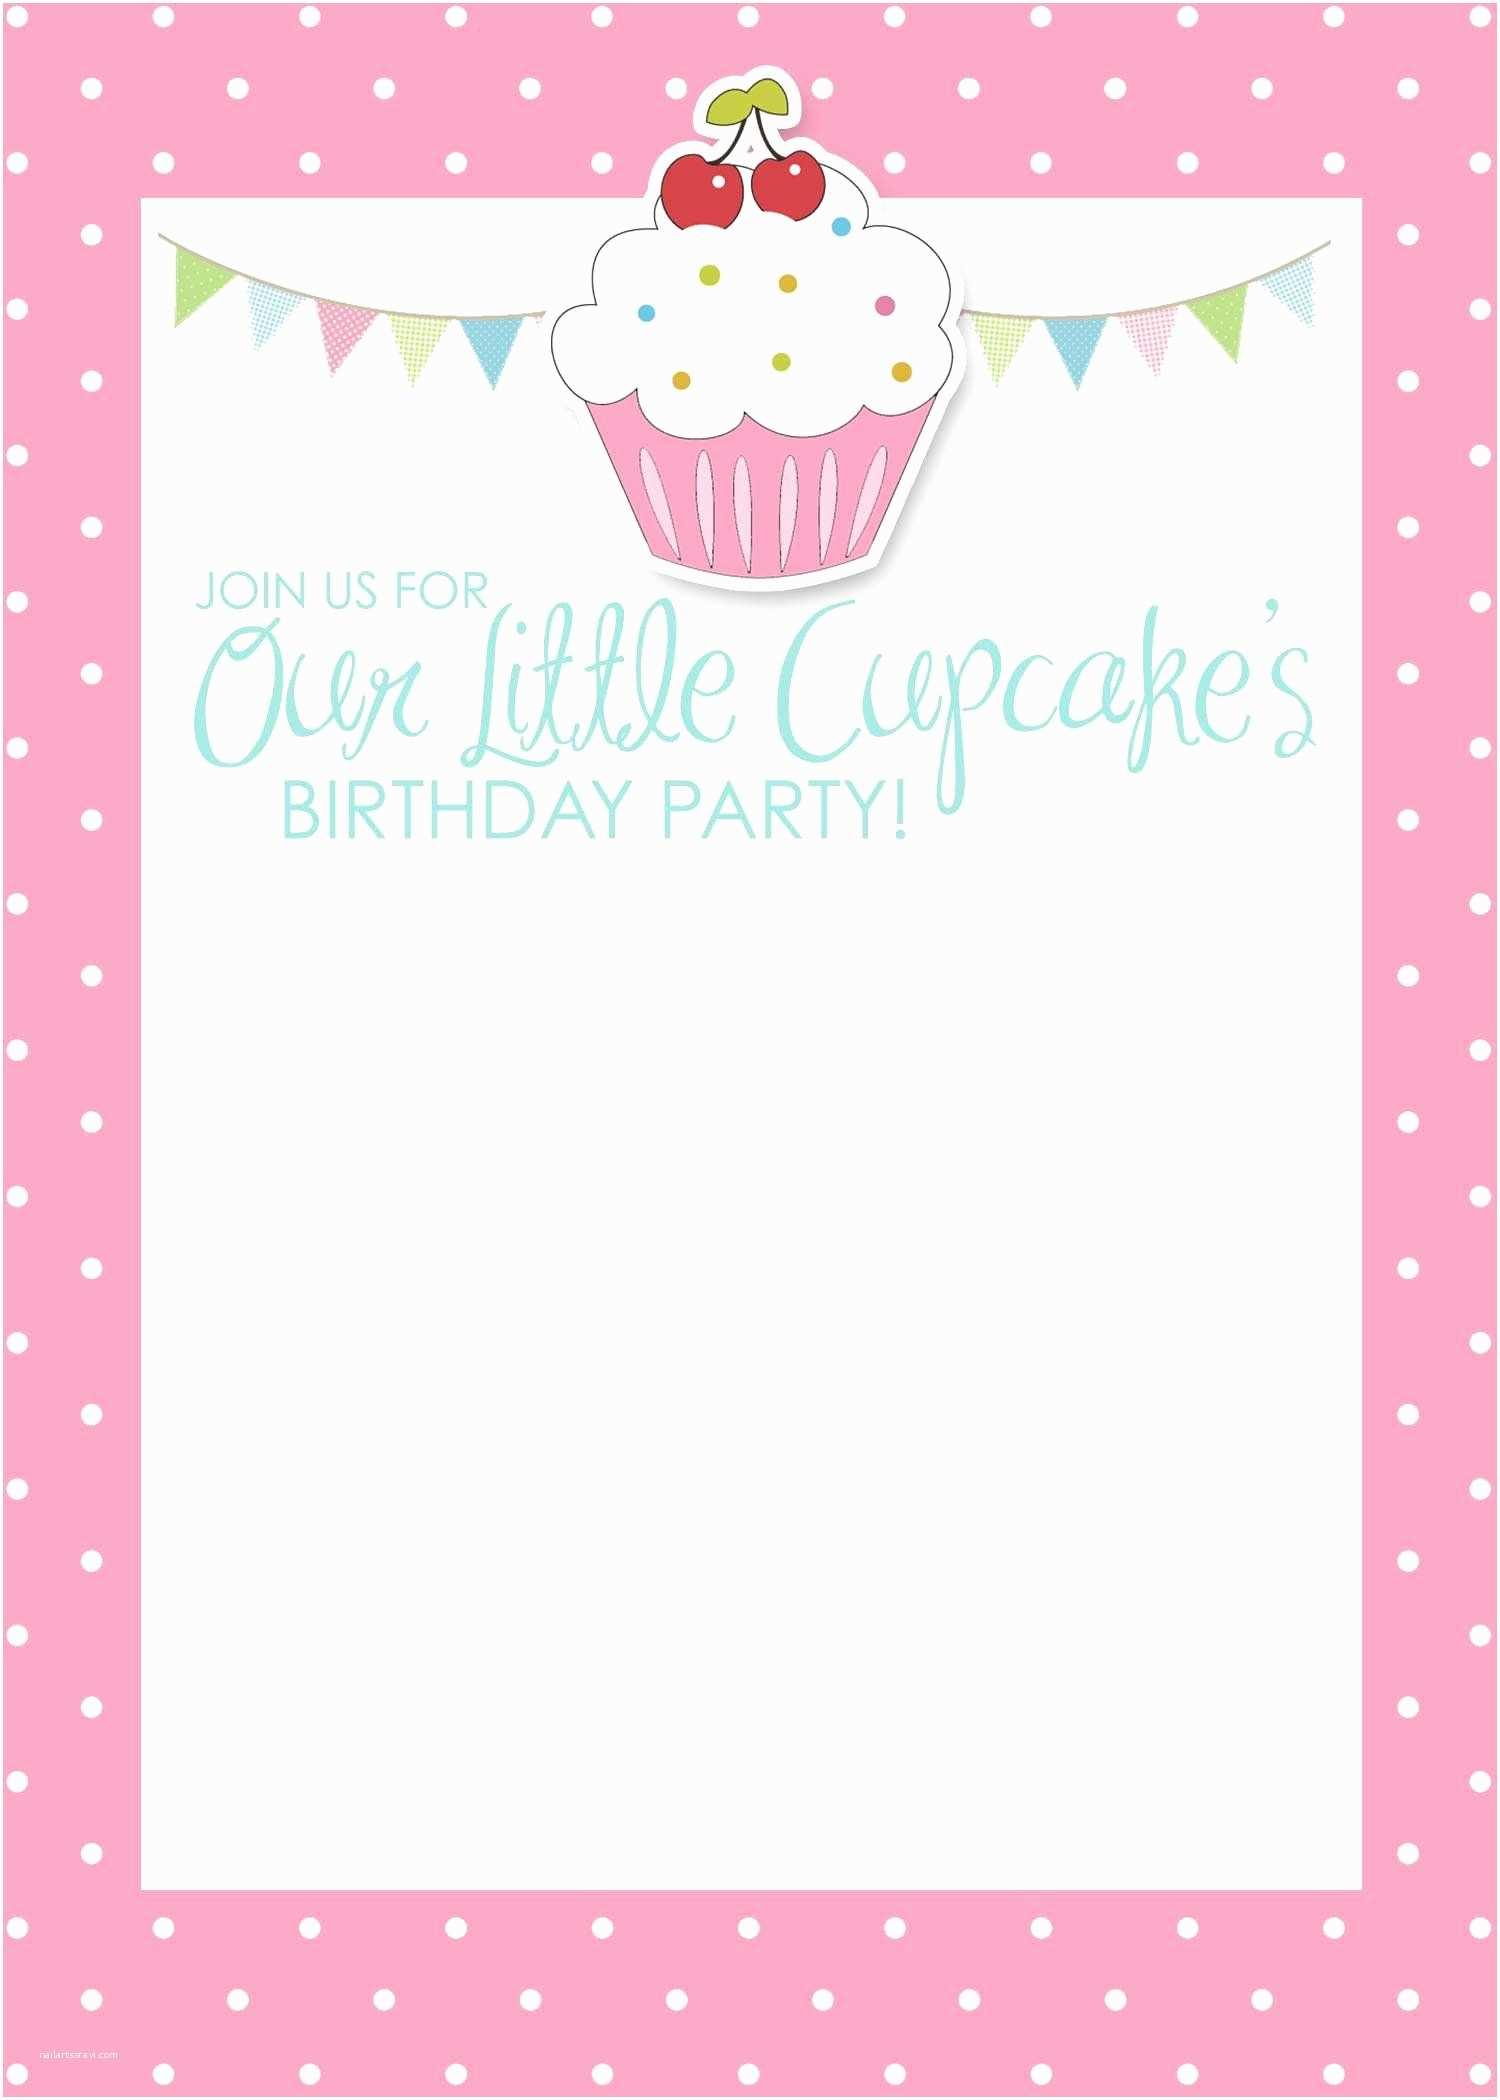 Free Birthday Party Invitations Free Printable Birthday Invitation